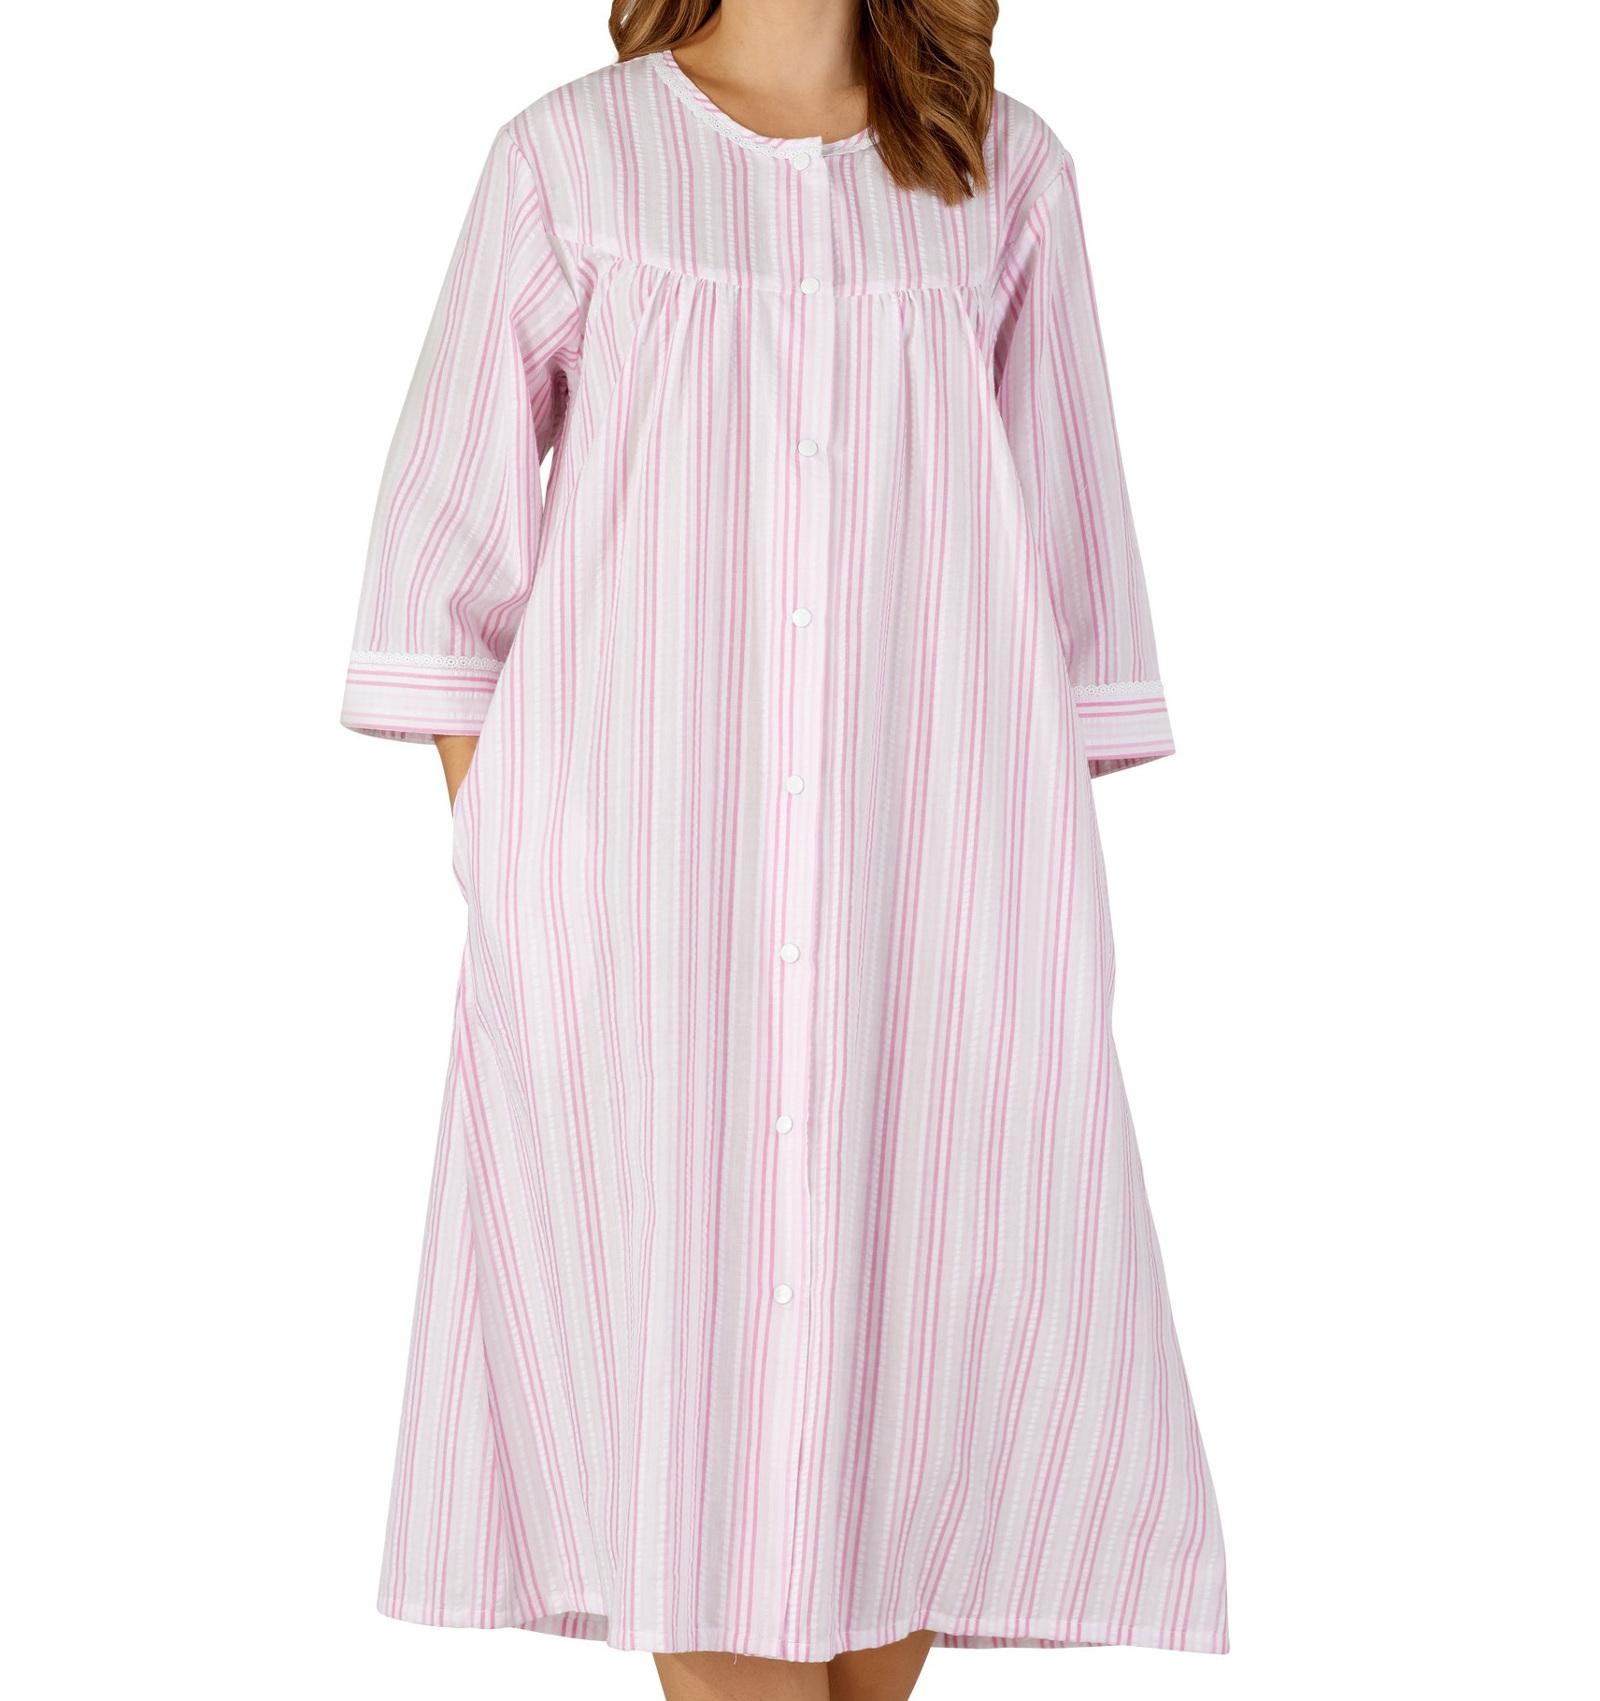 Bathrobe Button Poppers Womens Seersucker Stripe Concealed Pocket Dressing Gown